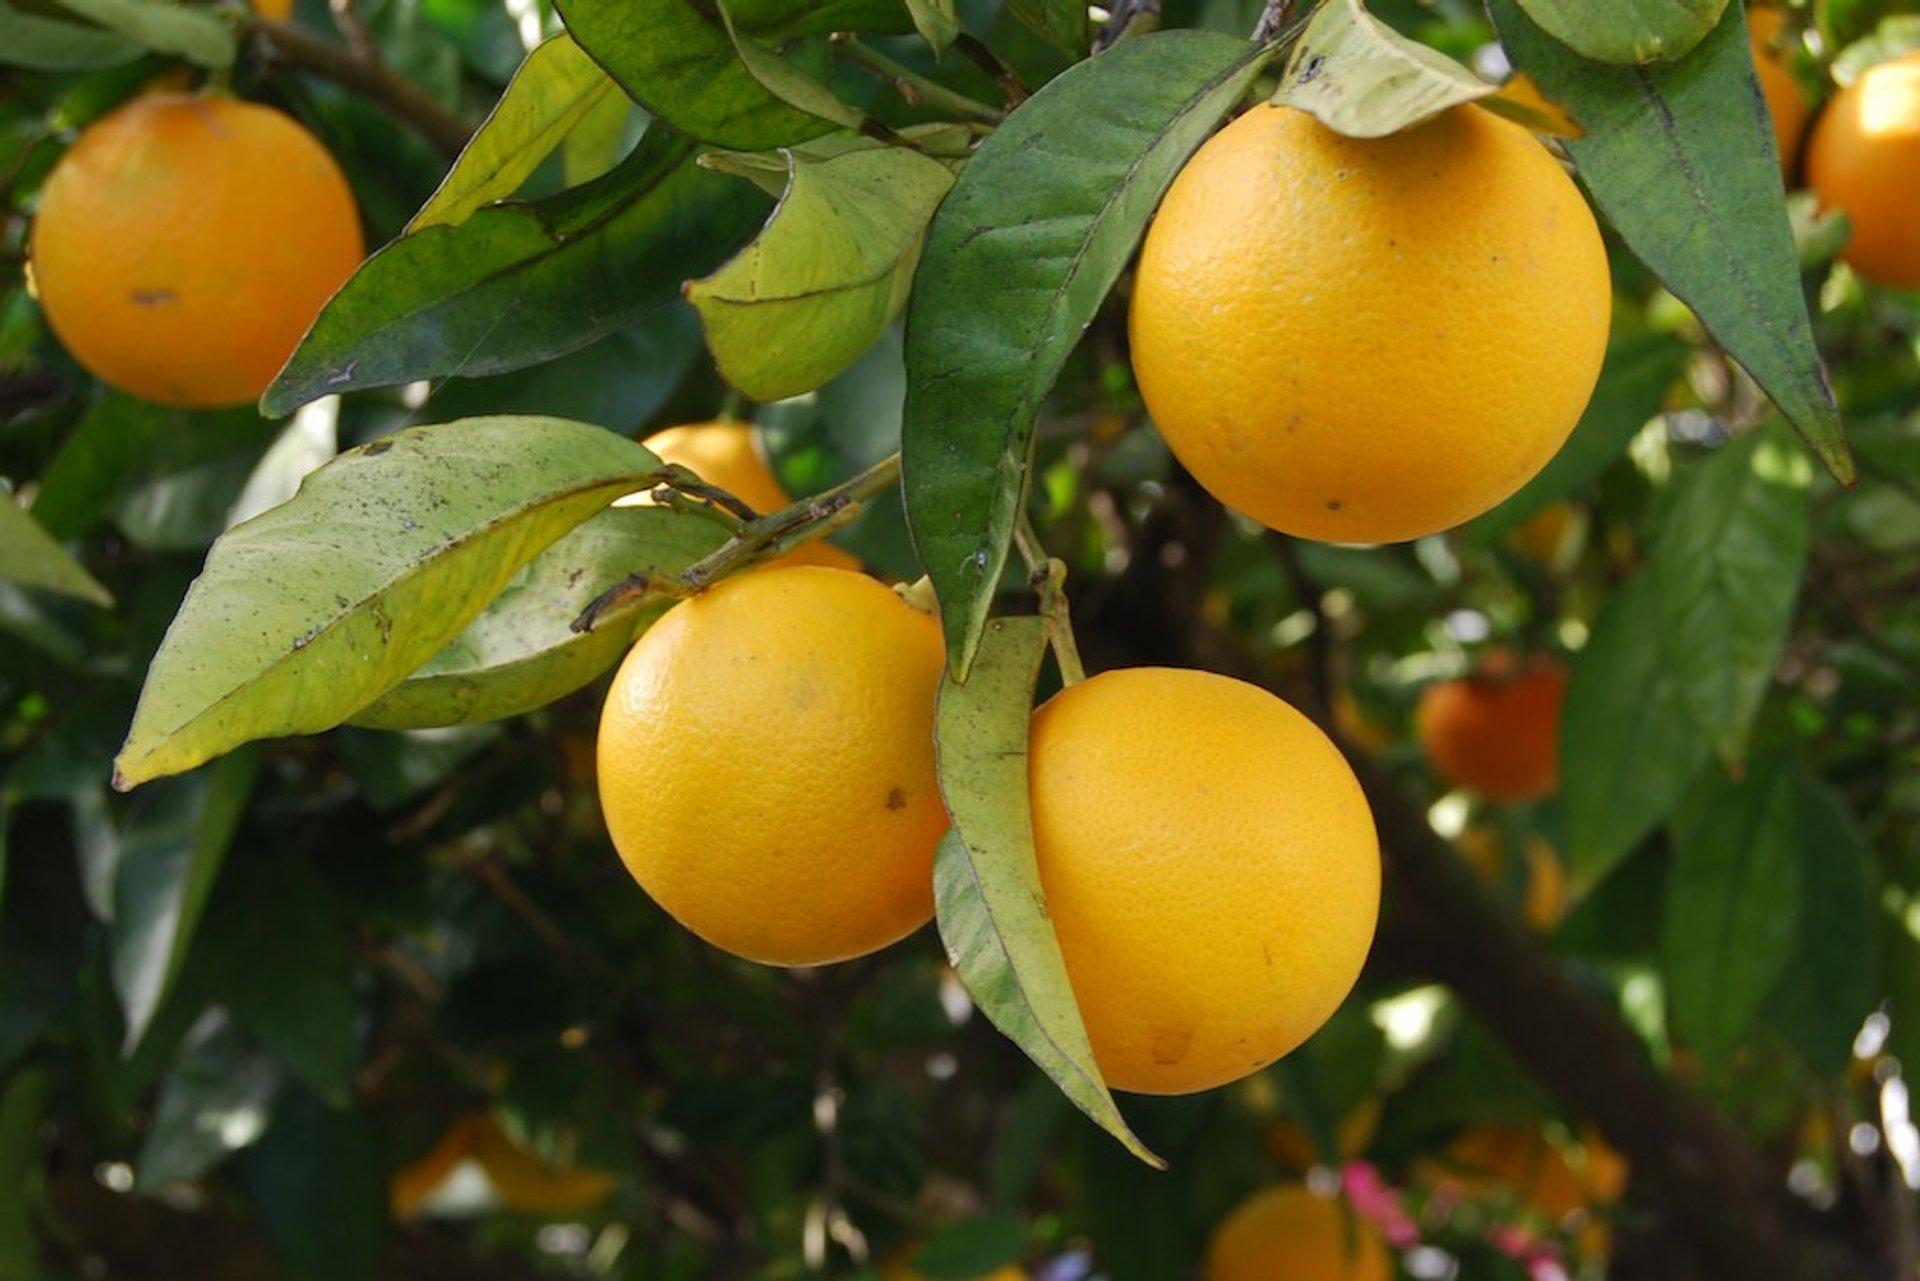 Orange Harvest in Portugal 2020 - Best Time